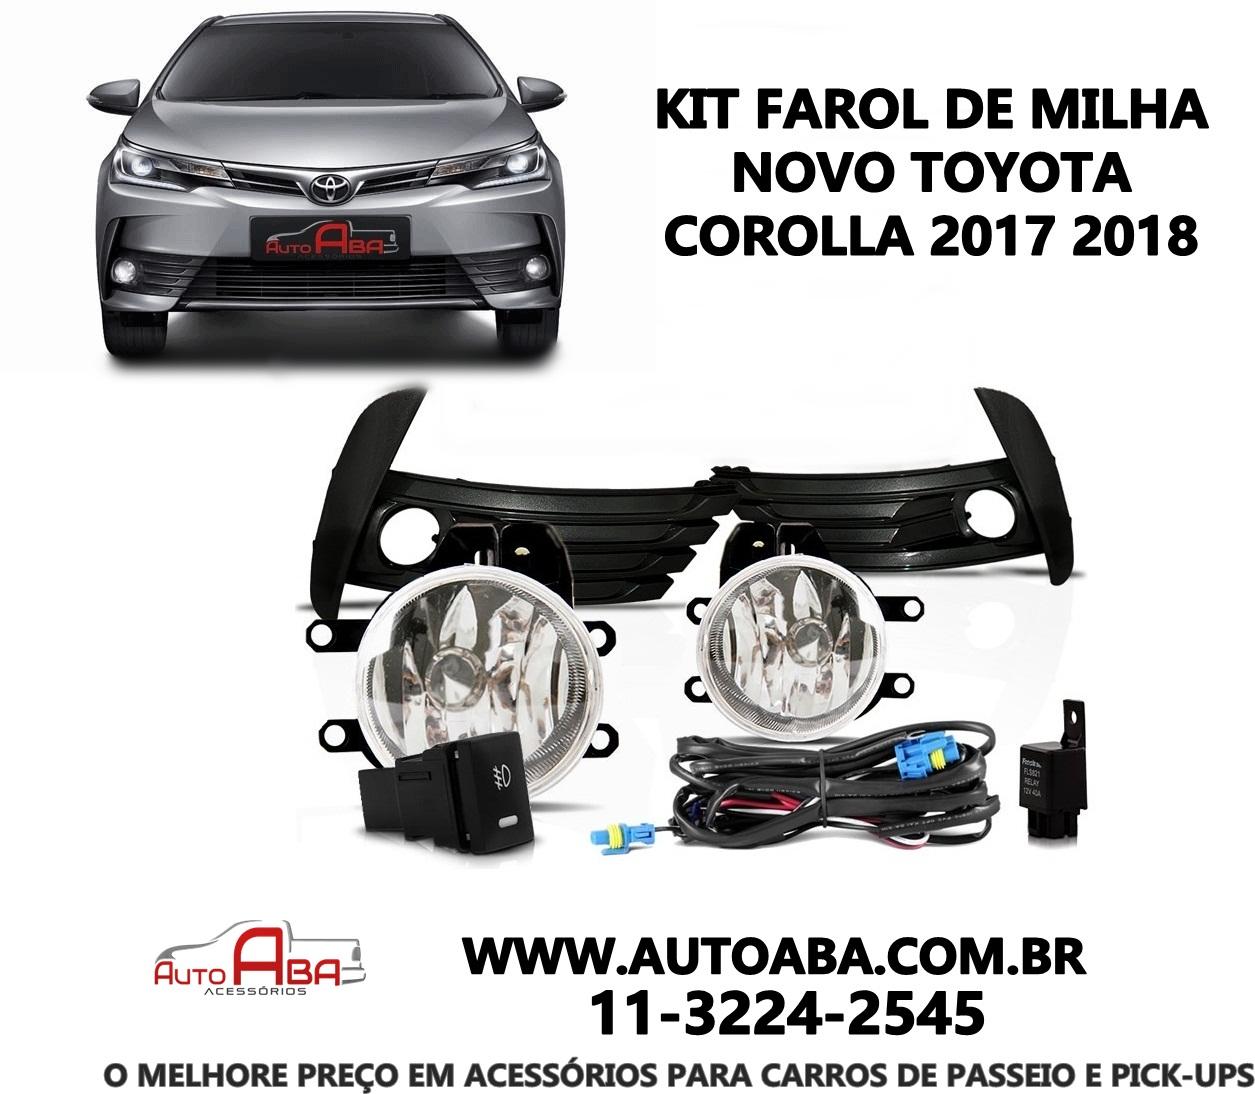 Kits de Farol Farois de Milha Auxiliares New Novo Corolla 2017 2018 AutoAba Acessórios 2